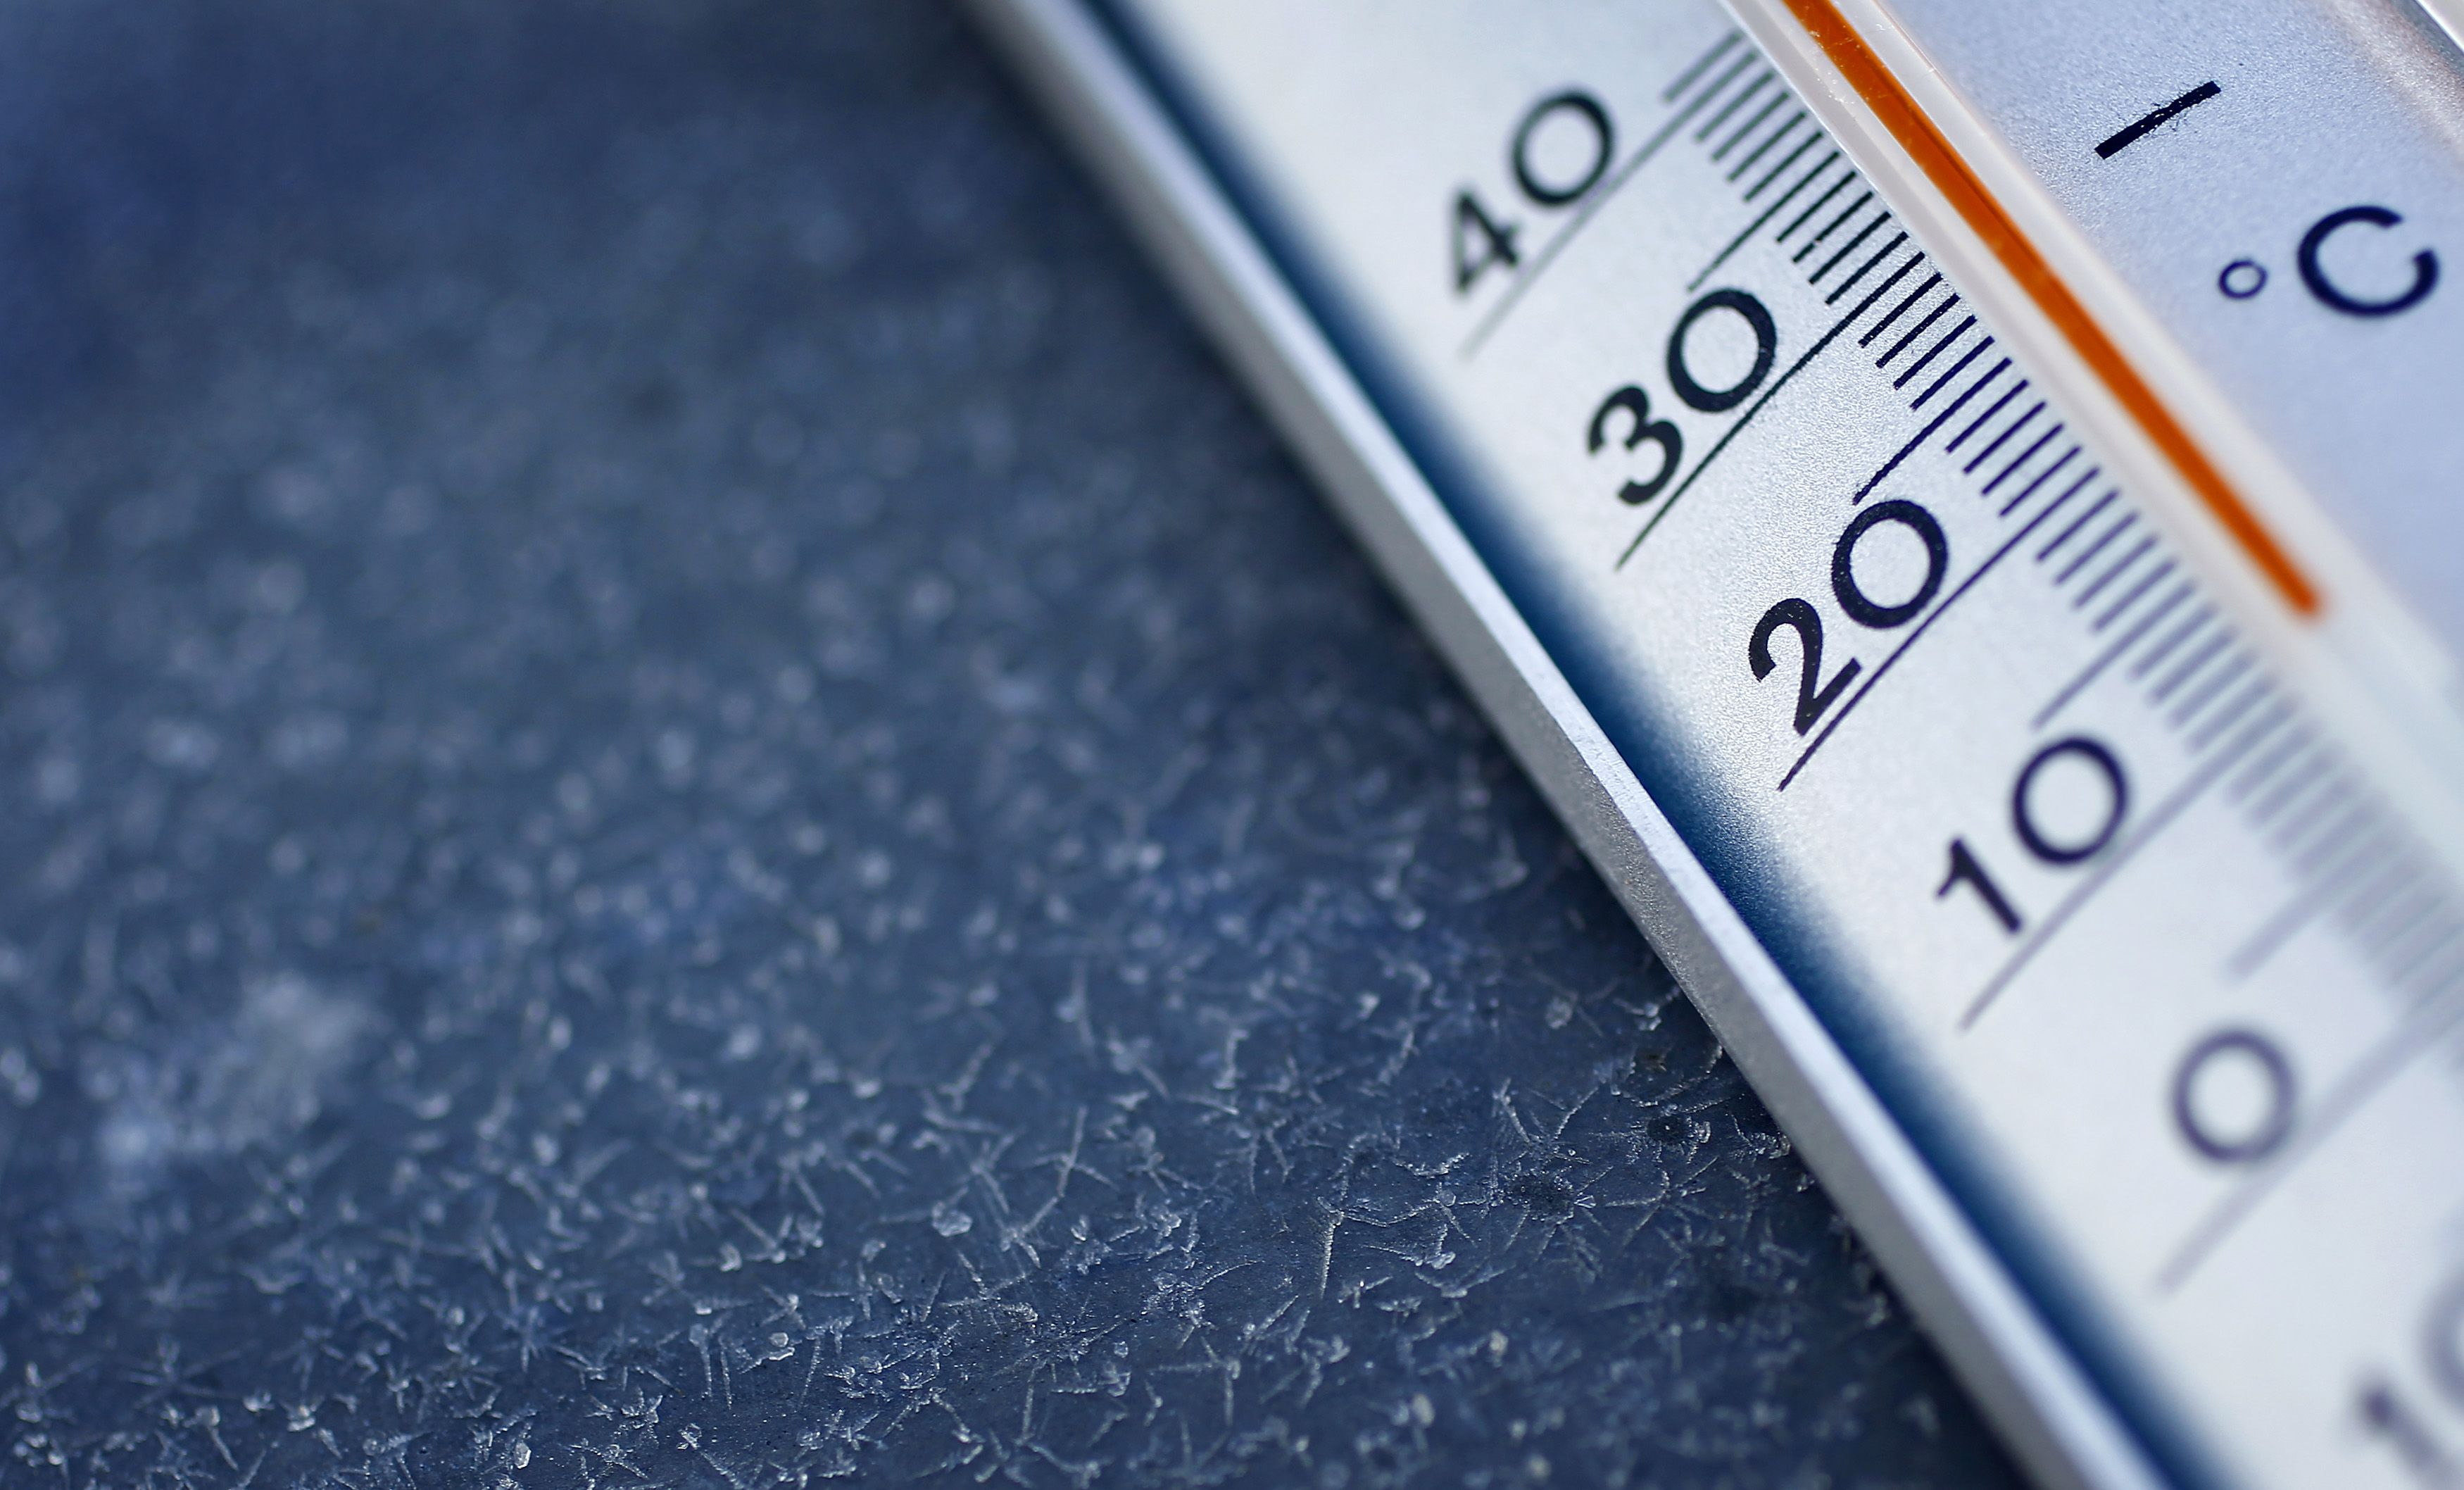 Un nouveau record de température mondiale sera battu en 2016